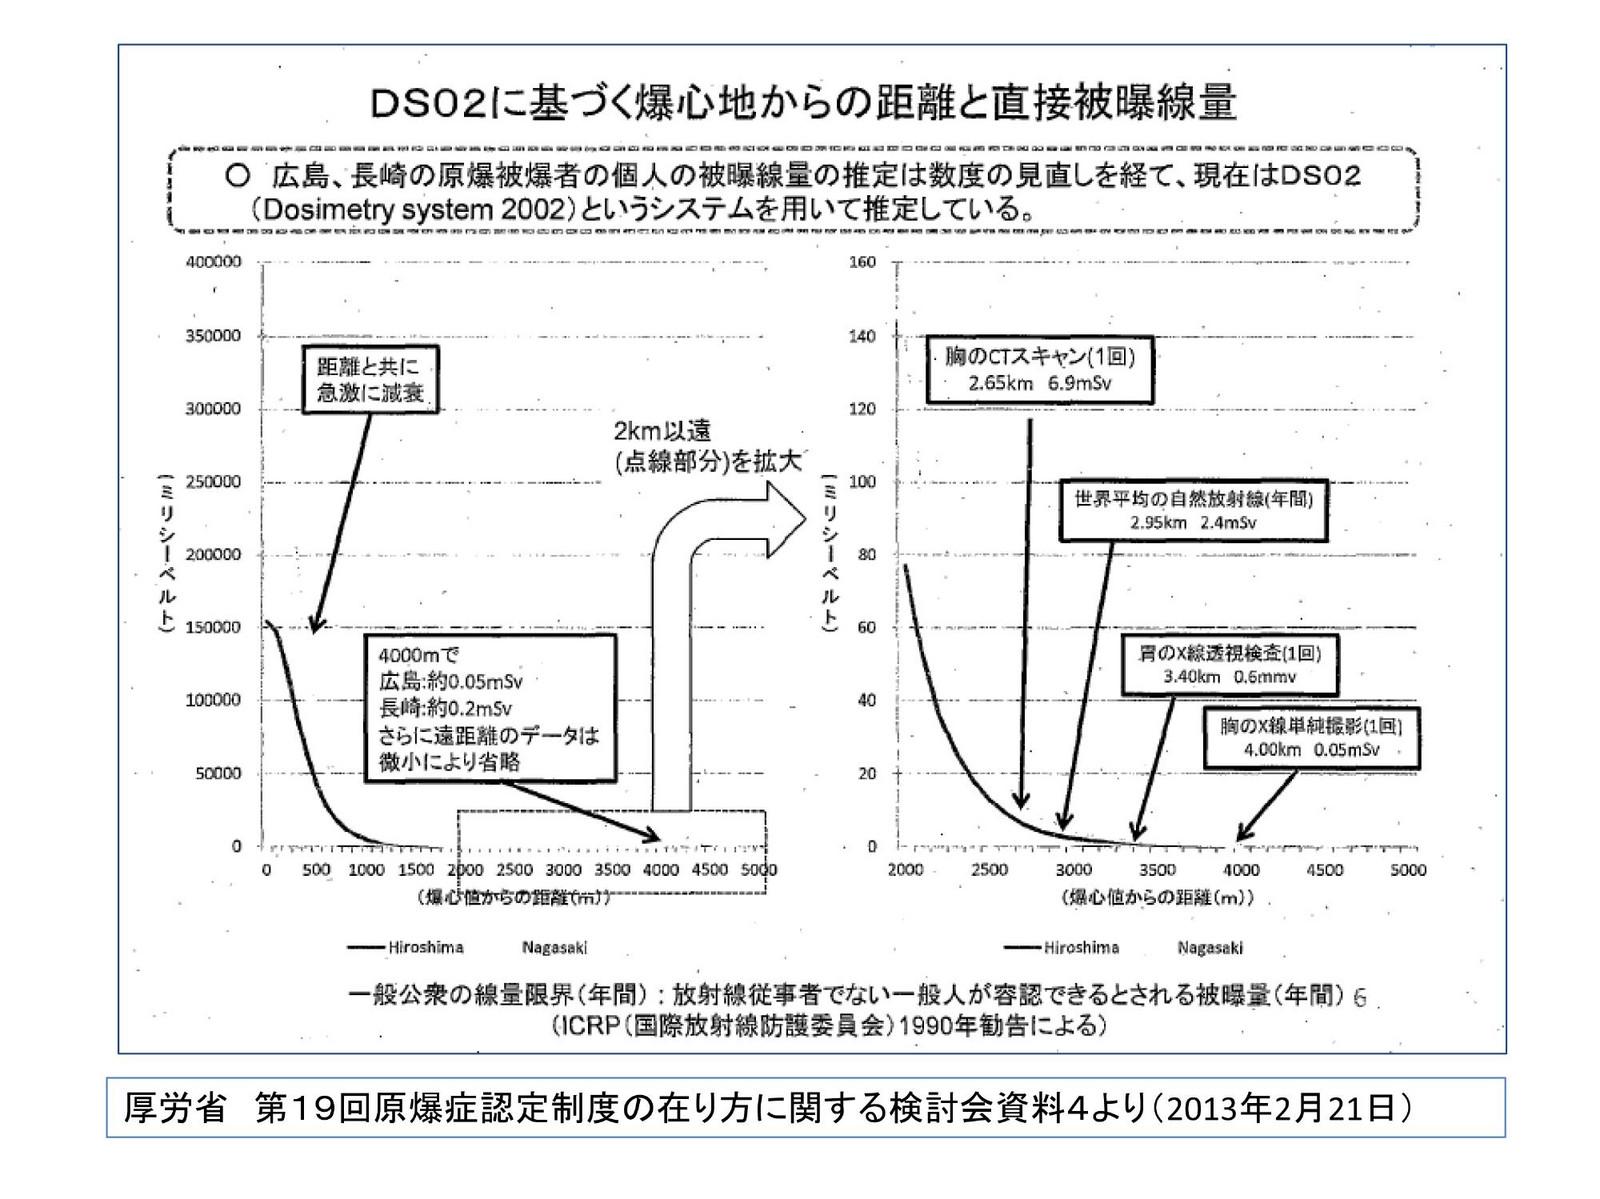 S_20170402yoshidaslide12